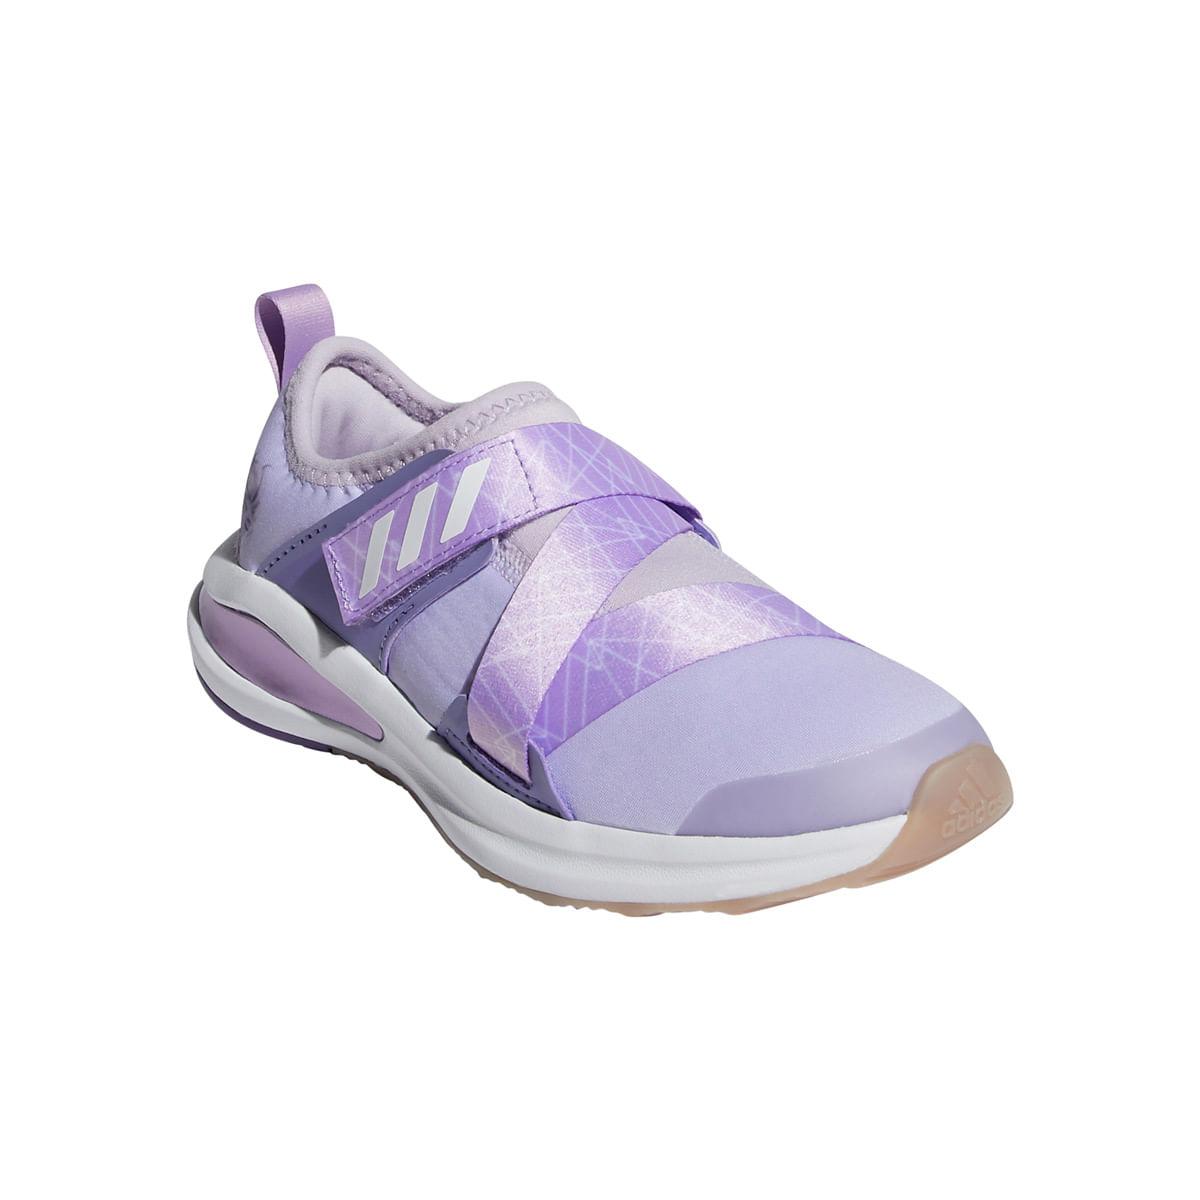 Tenis-Infantil-Adidas-FortaRun-X-Frozen-C--26-ao-32-